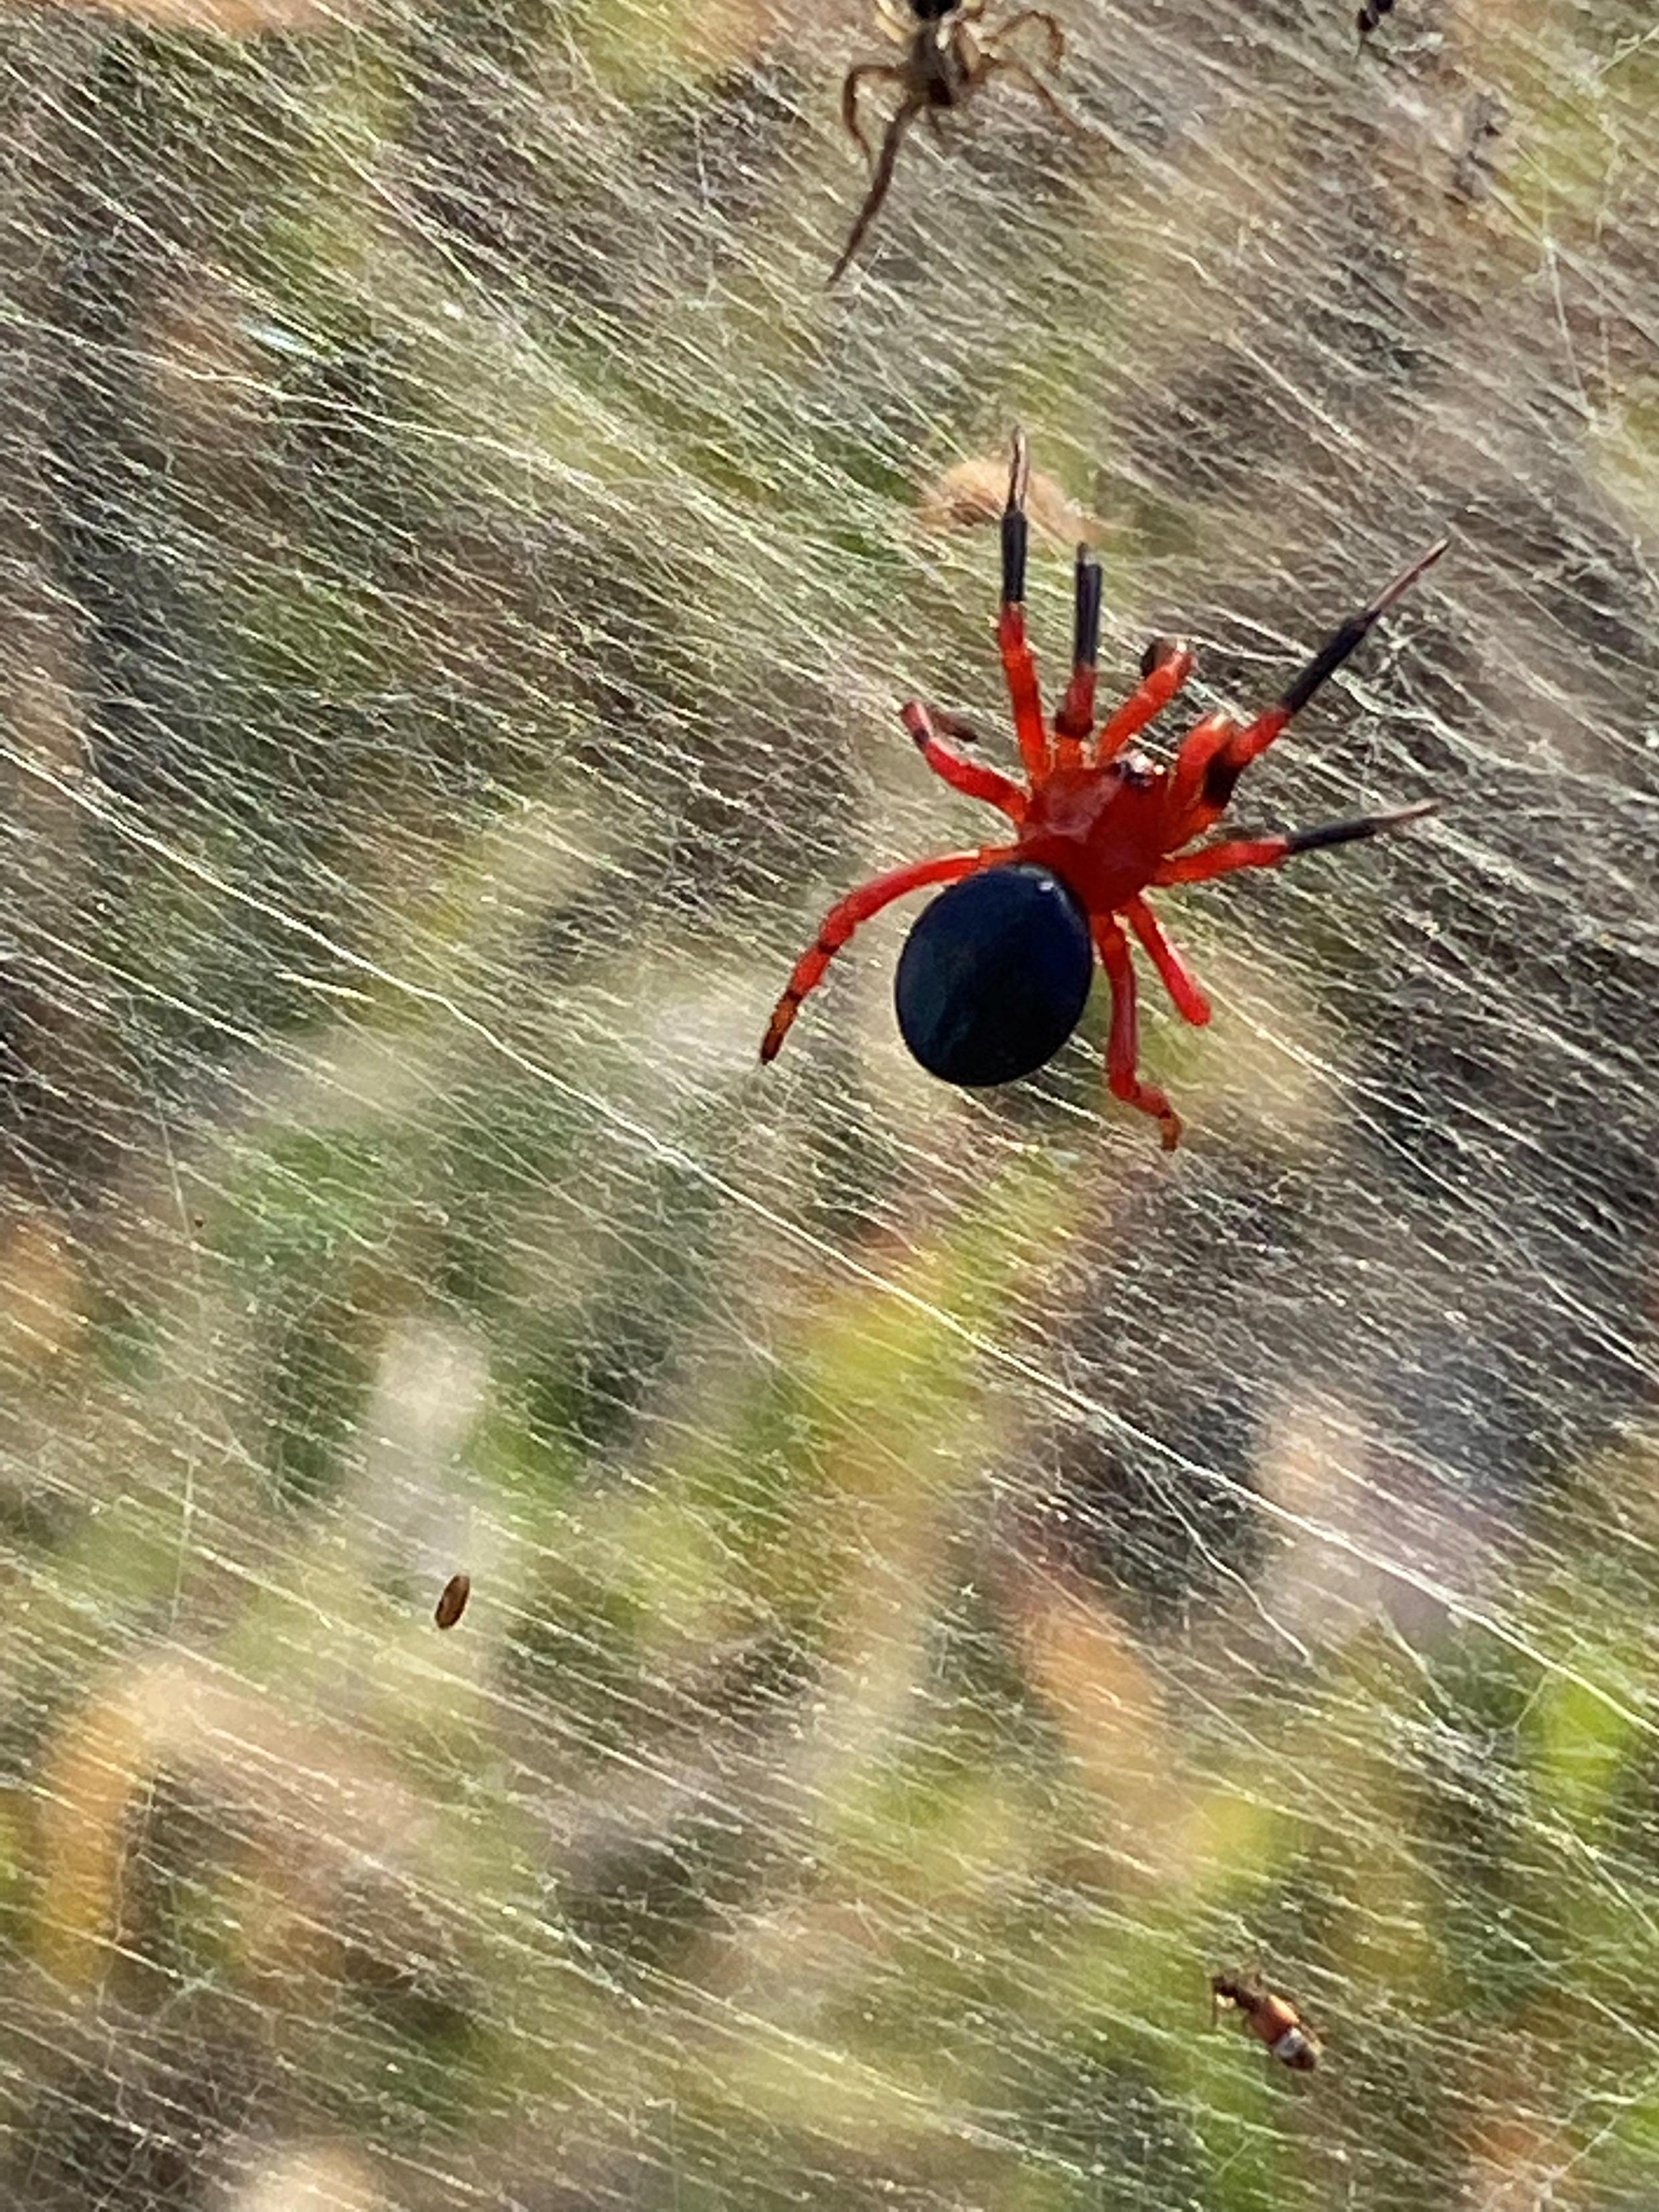 2021-06-16T065756Z_1418954885_RC250O92ELV8_RTRMADP_3_AUSTRALIA-SPIDERS-WEB